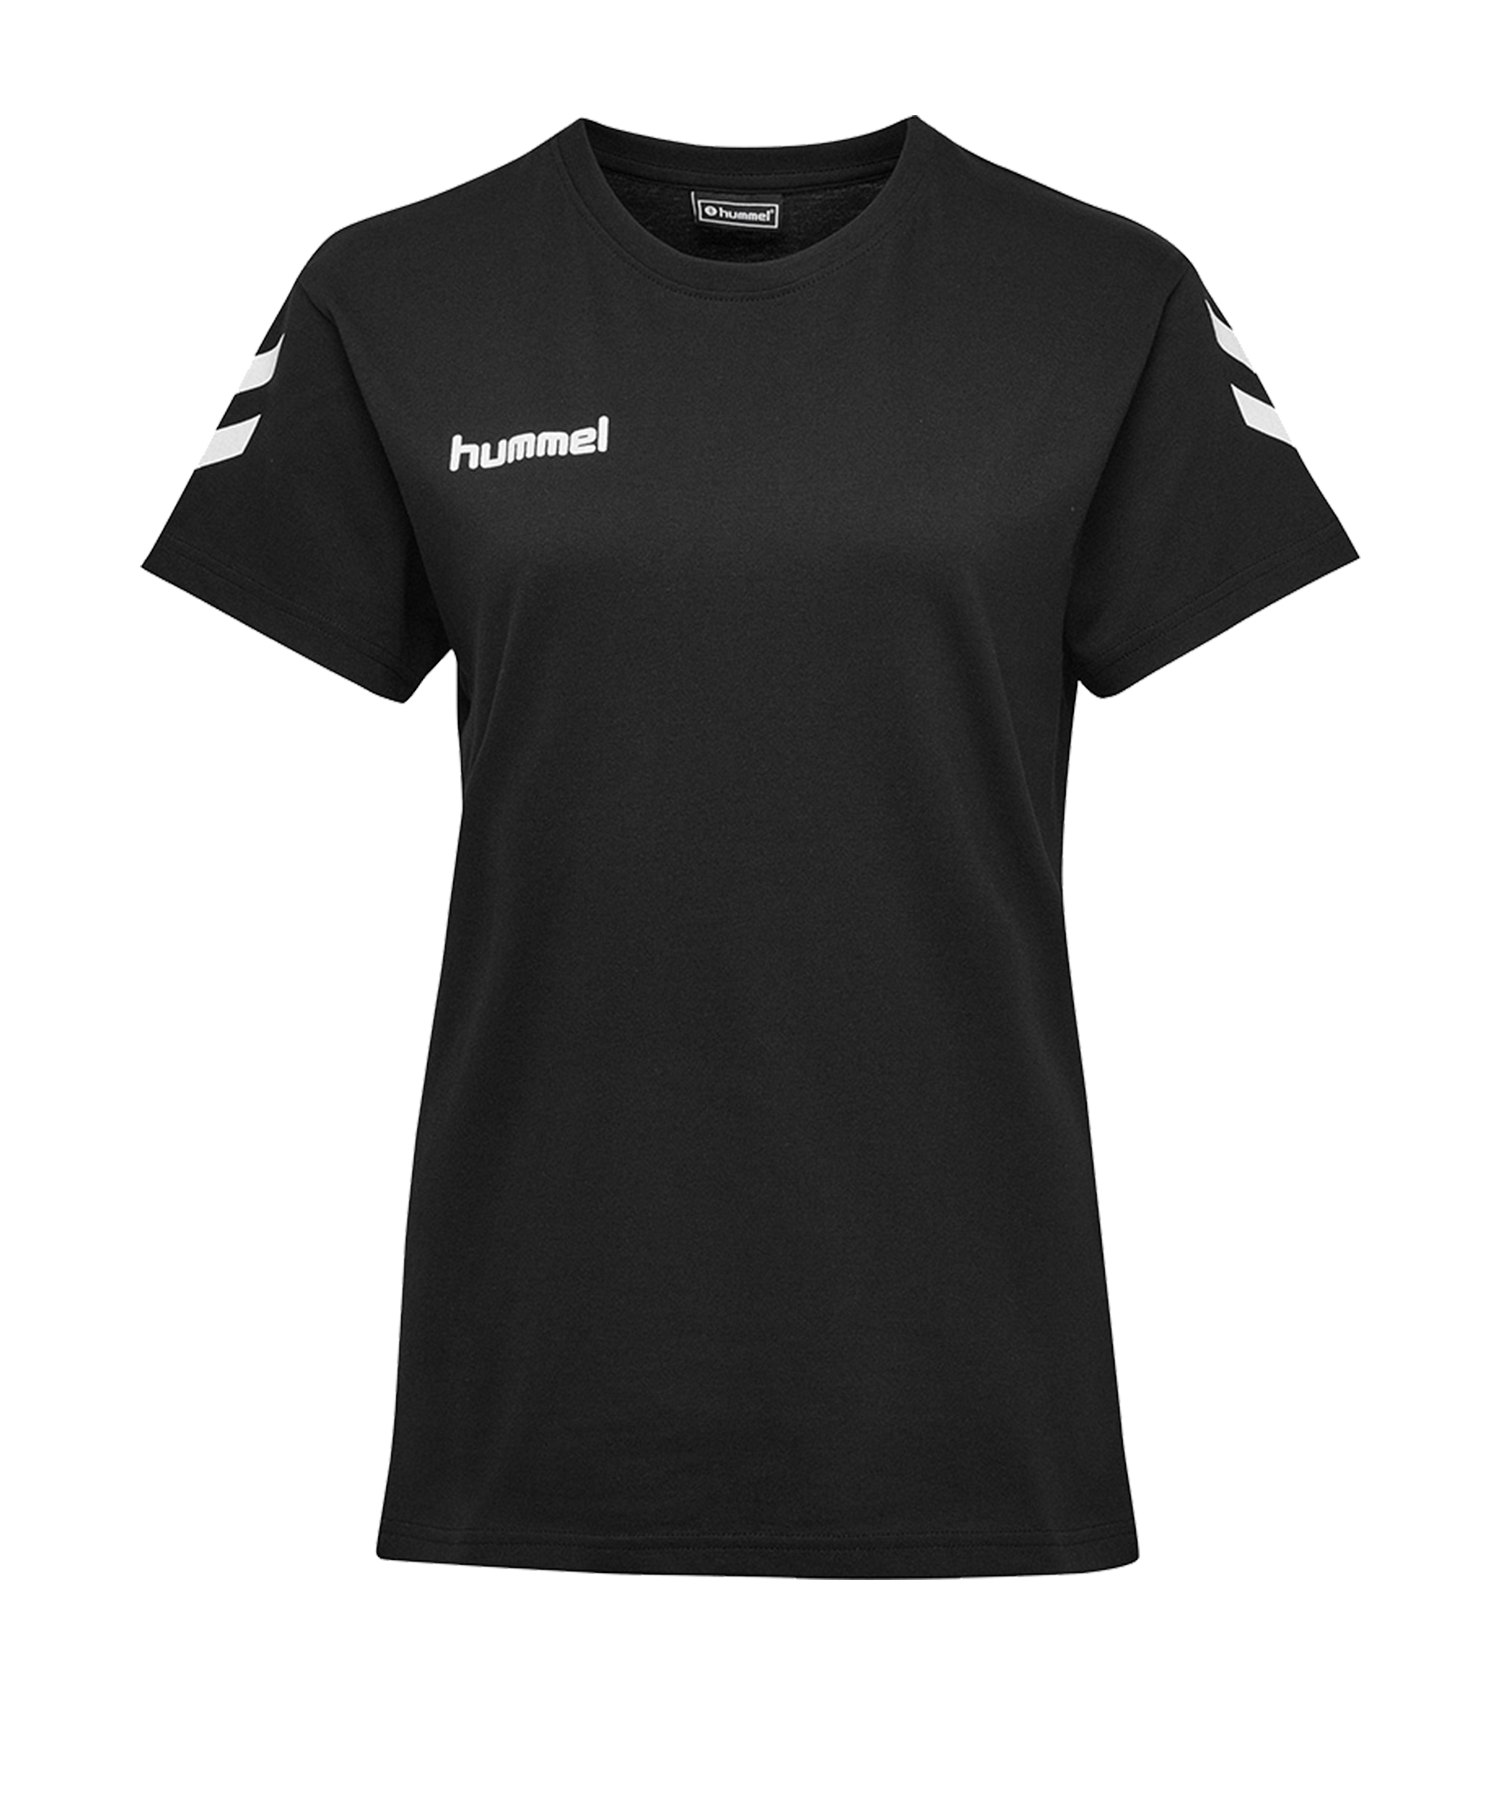 Hummel Cotton T-Shirt Damen Schwarz F2001 - Schwarz